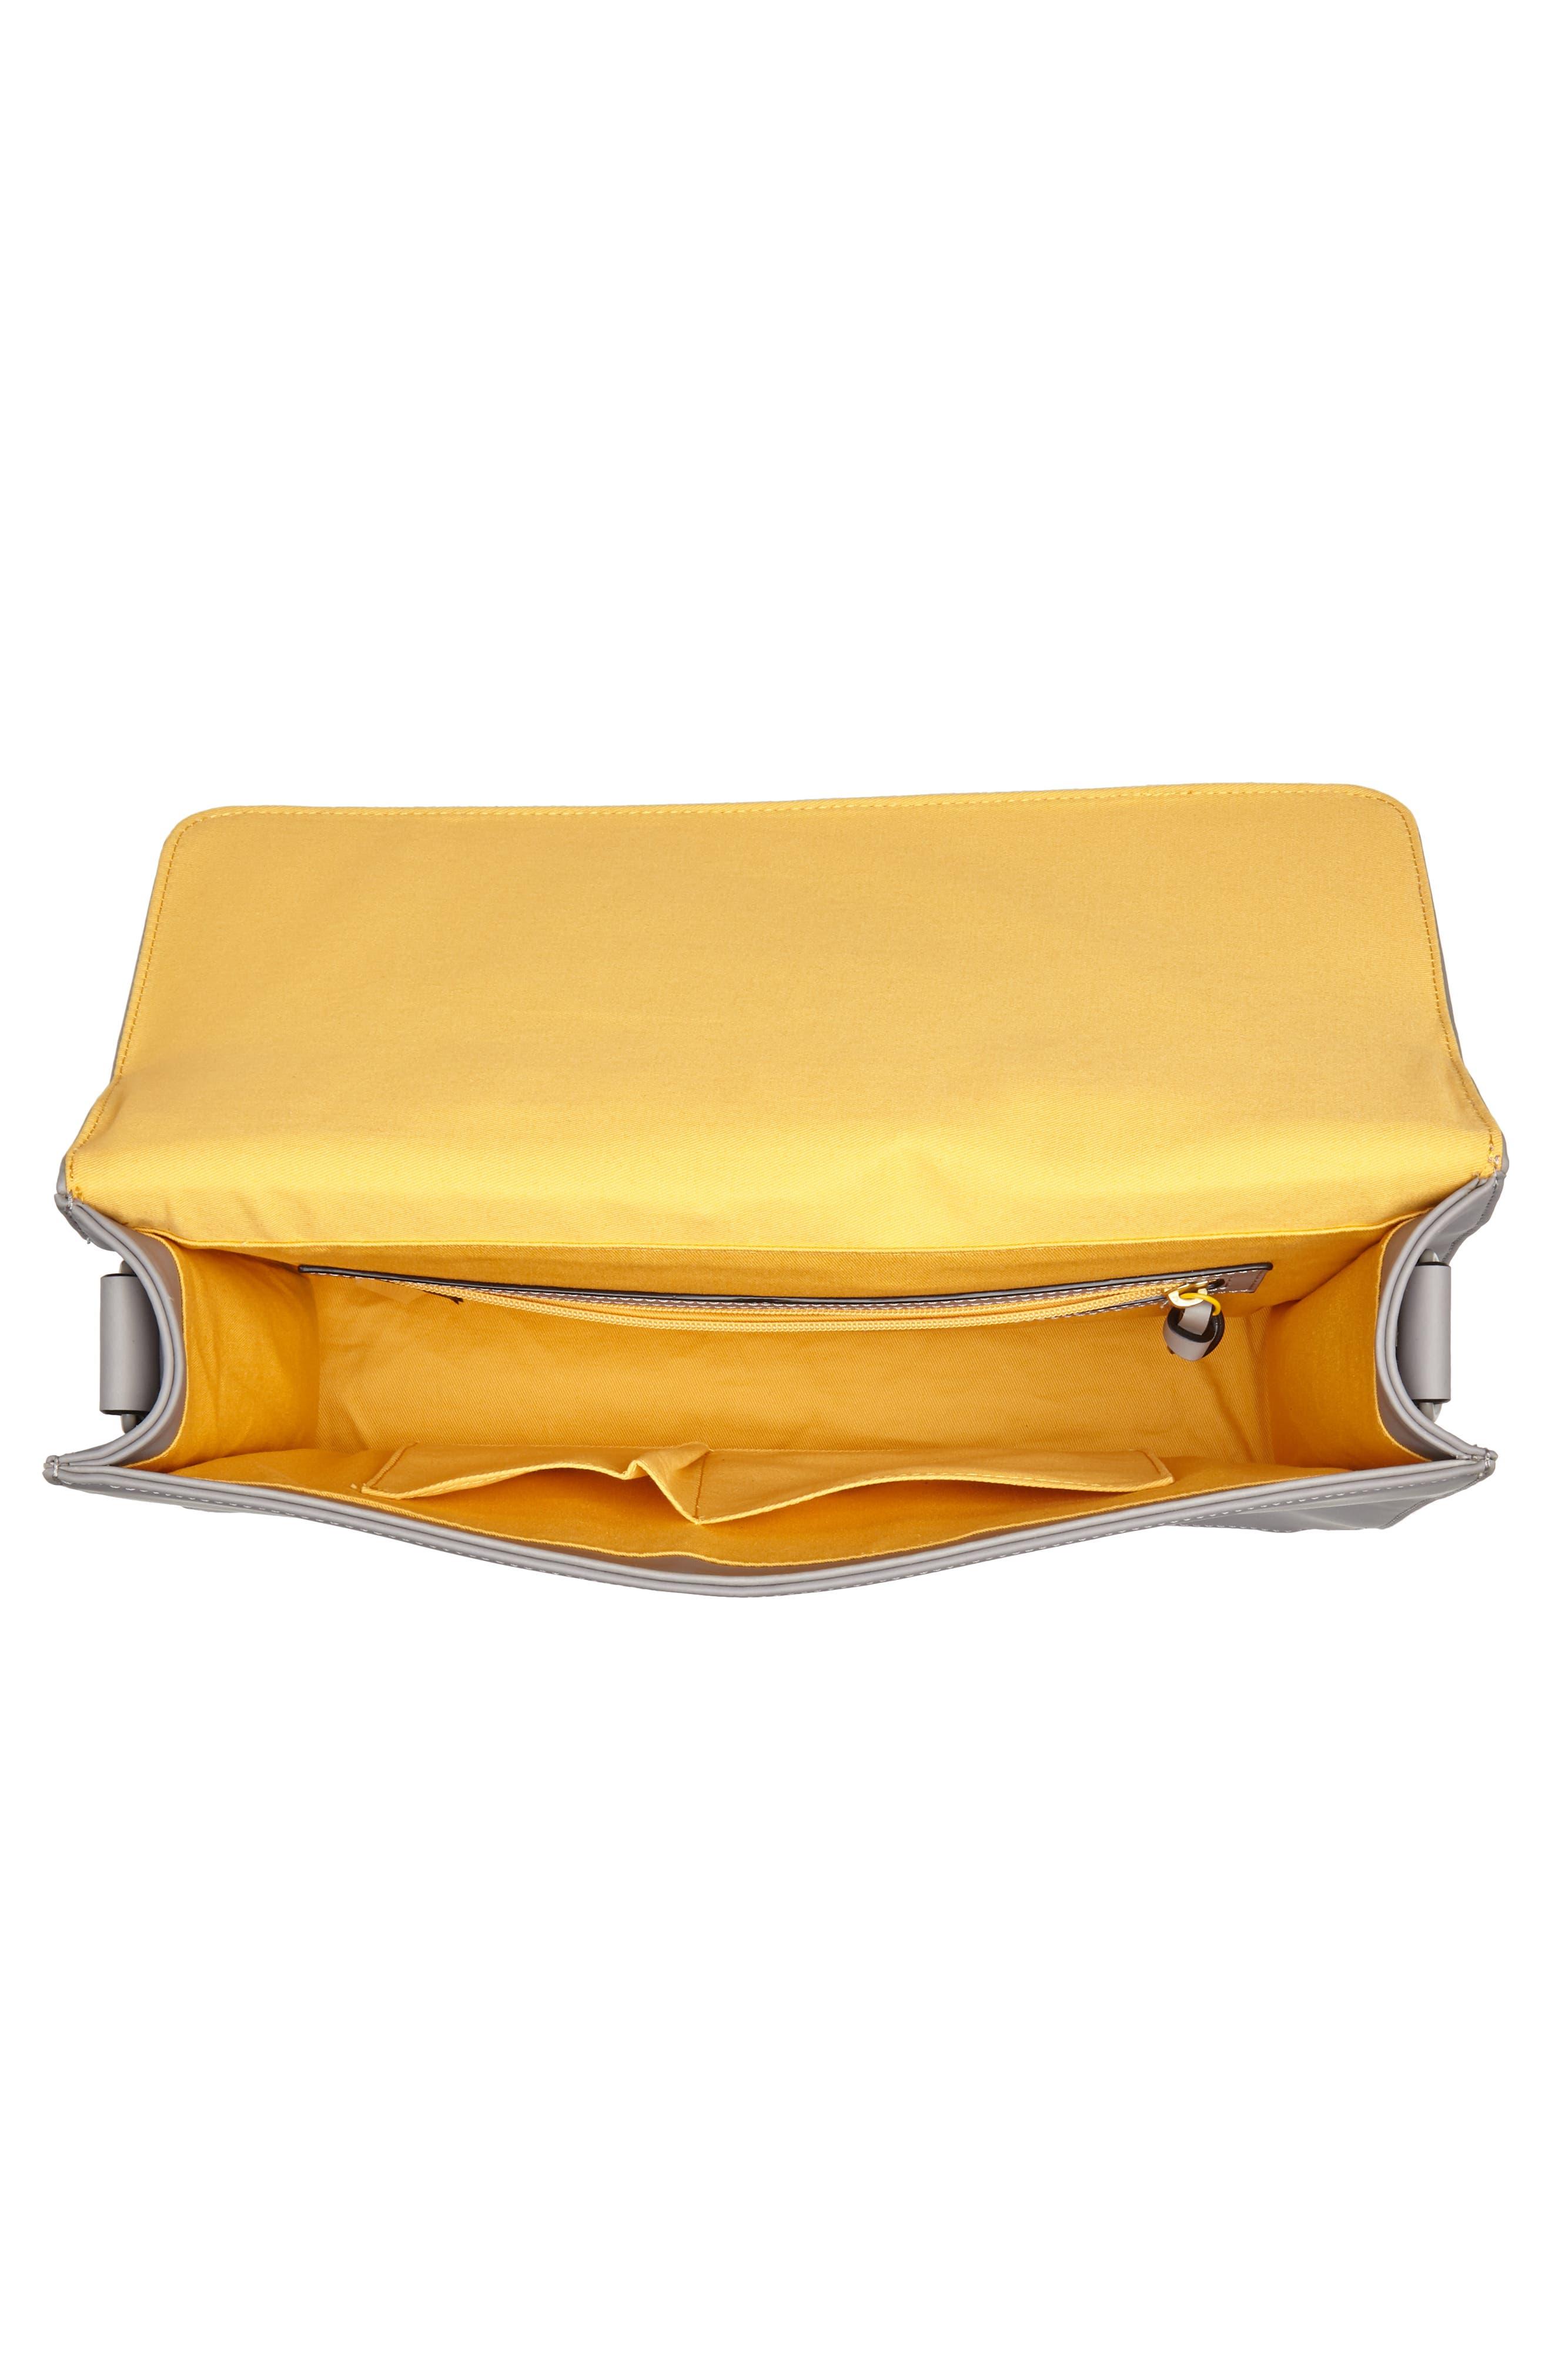 Barma Rubberized Briefcase,                             Alternate thumbnail 4, color,                             030